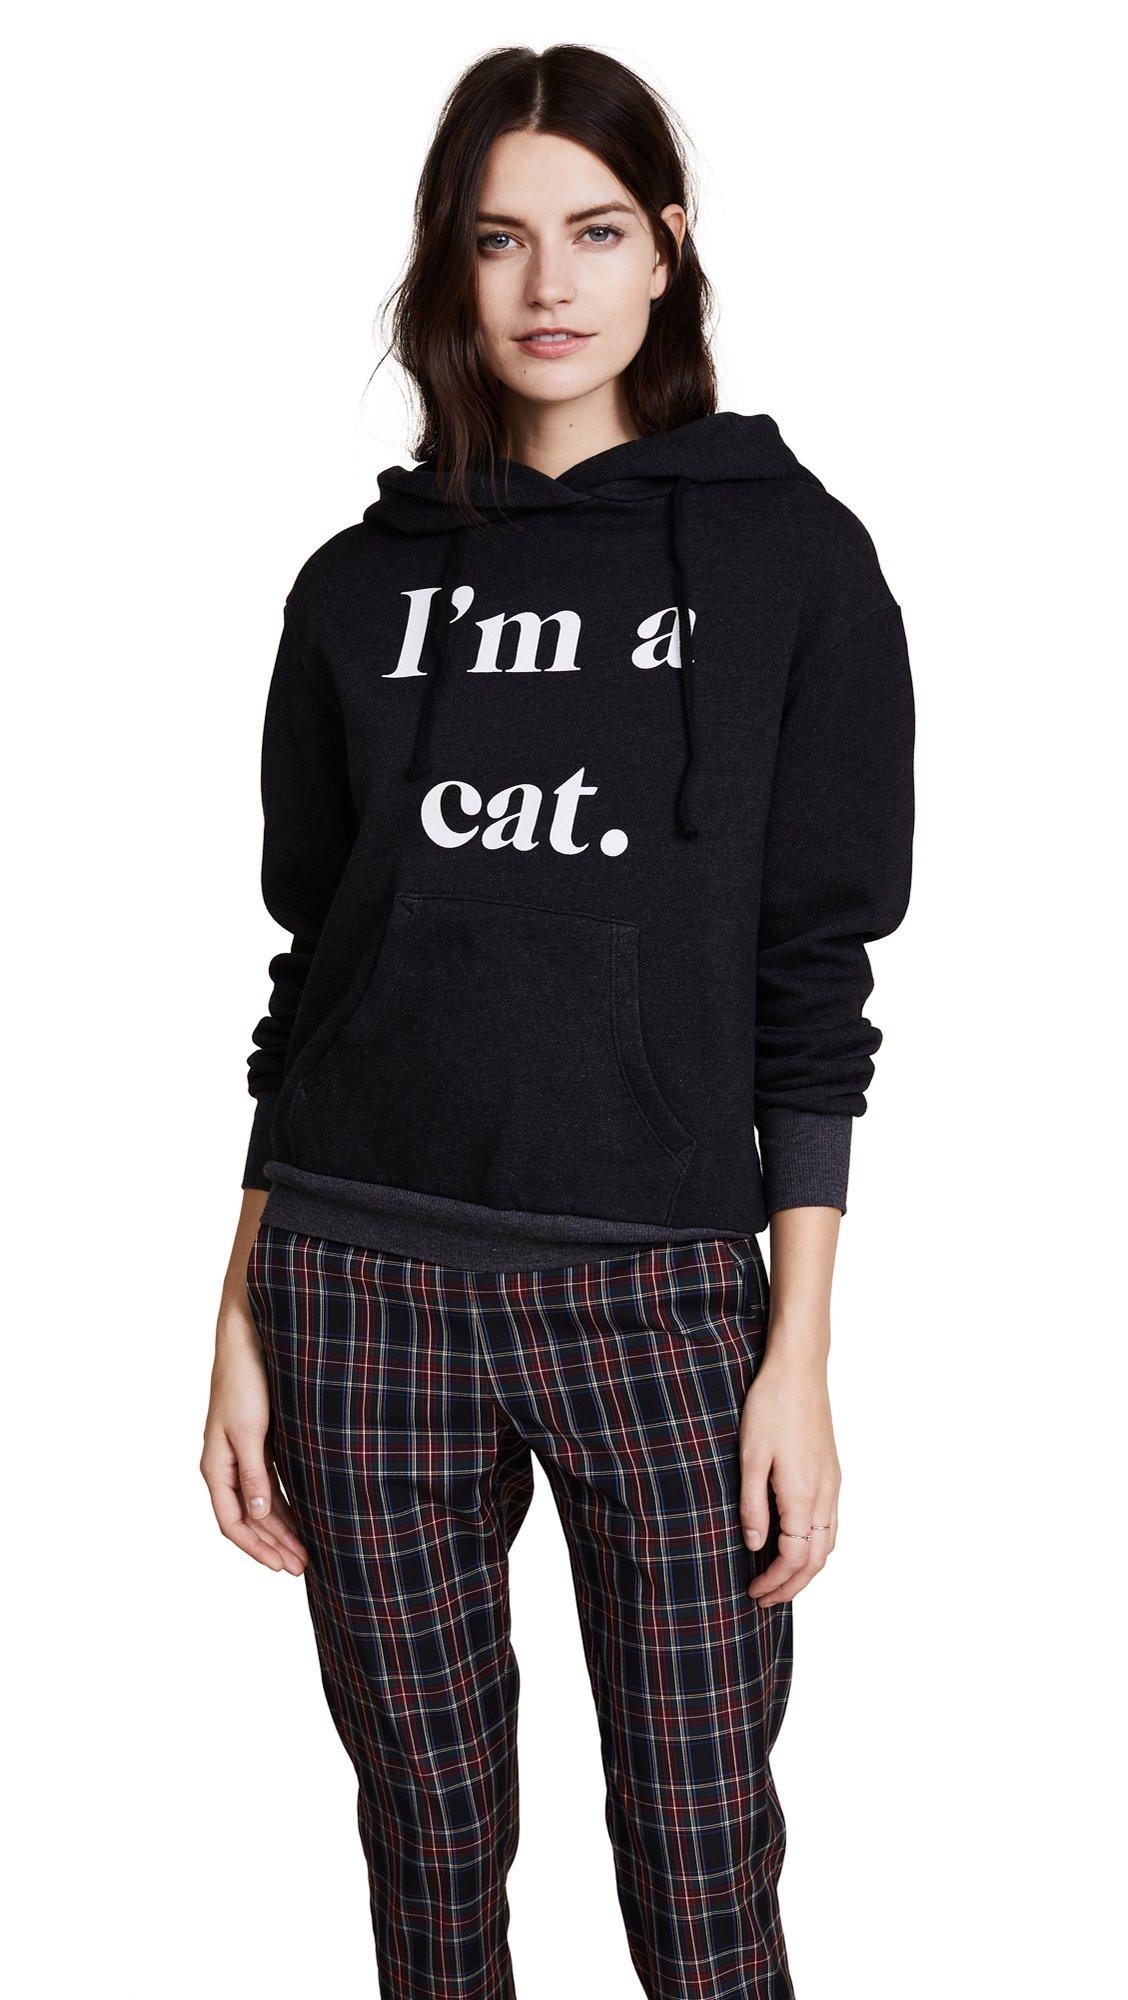 Wildfox Women's I'm a Cat Hoodie, Black, Medium